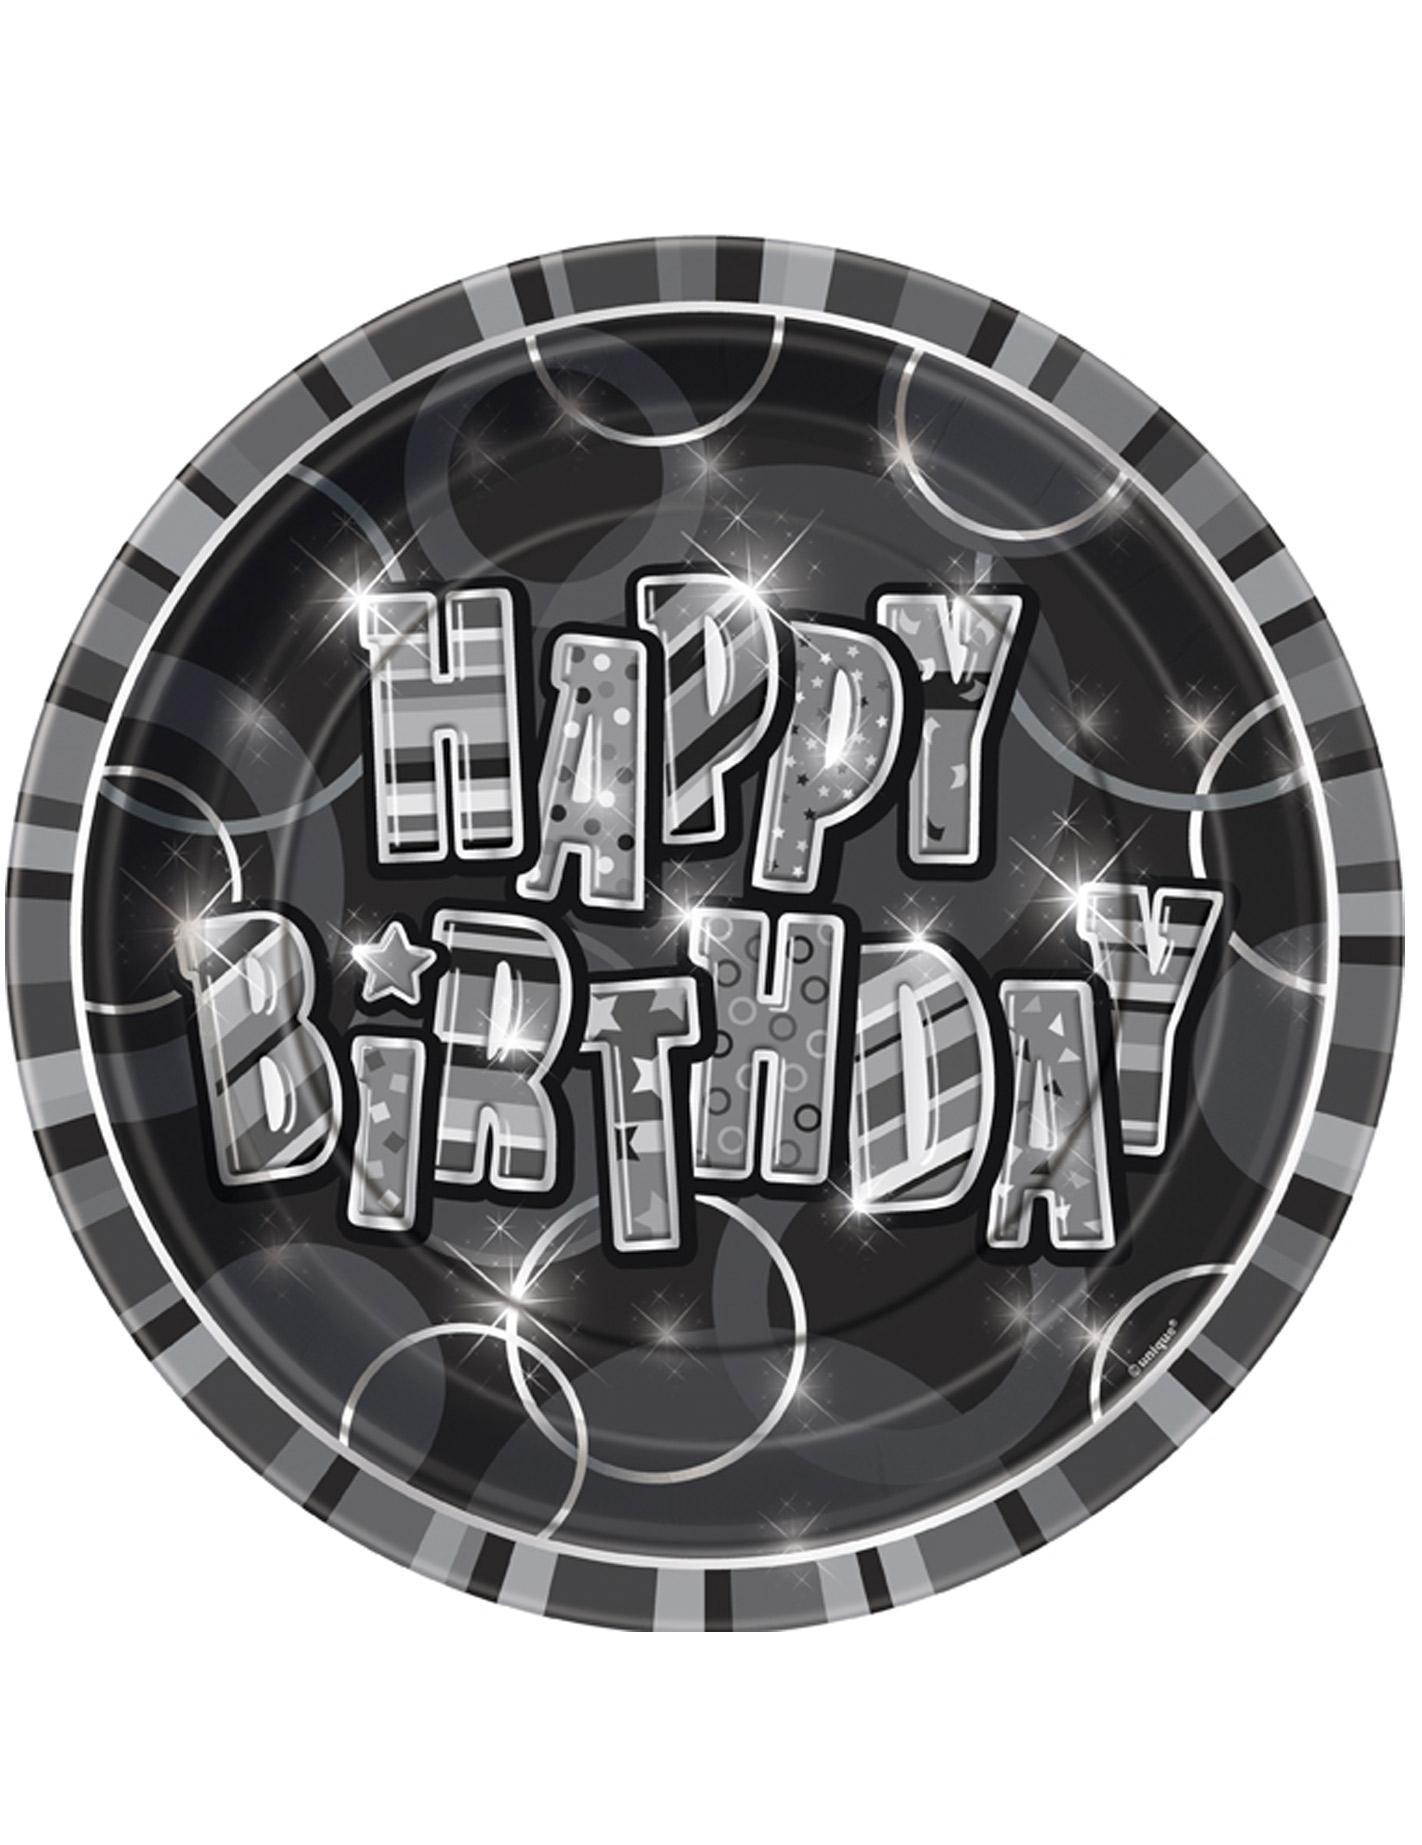 Geburtstagsteller Happy Birthday Geburtstag Tischdeko 8 Stuck